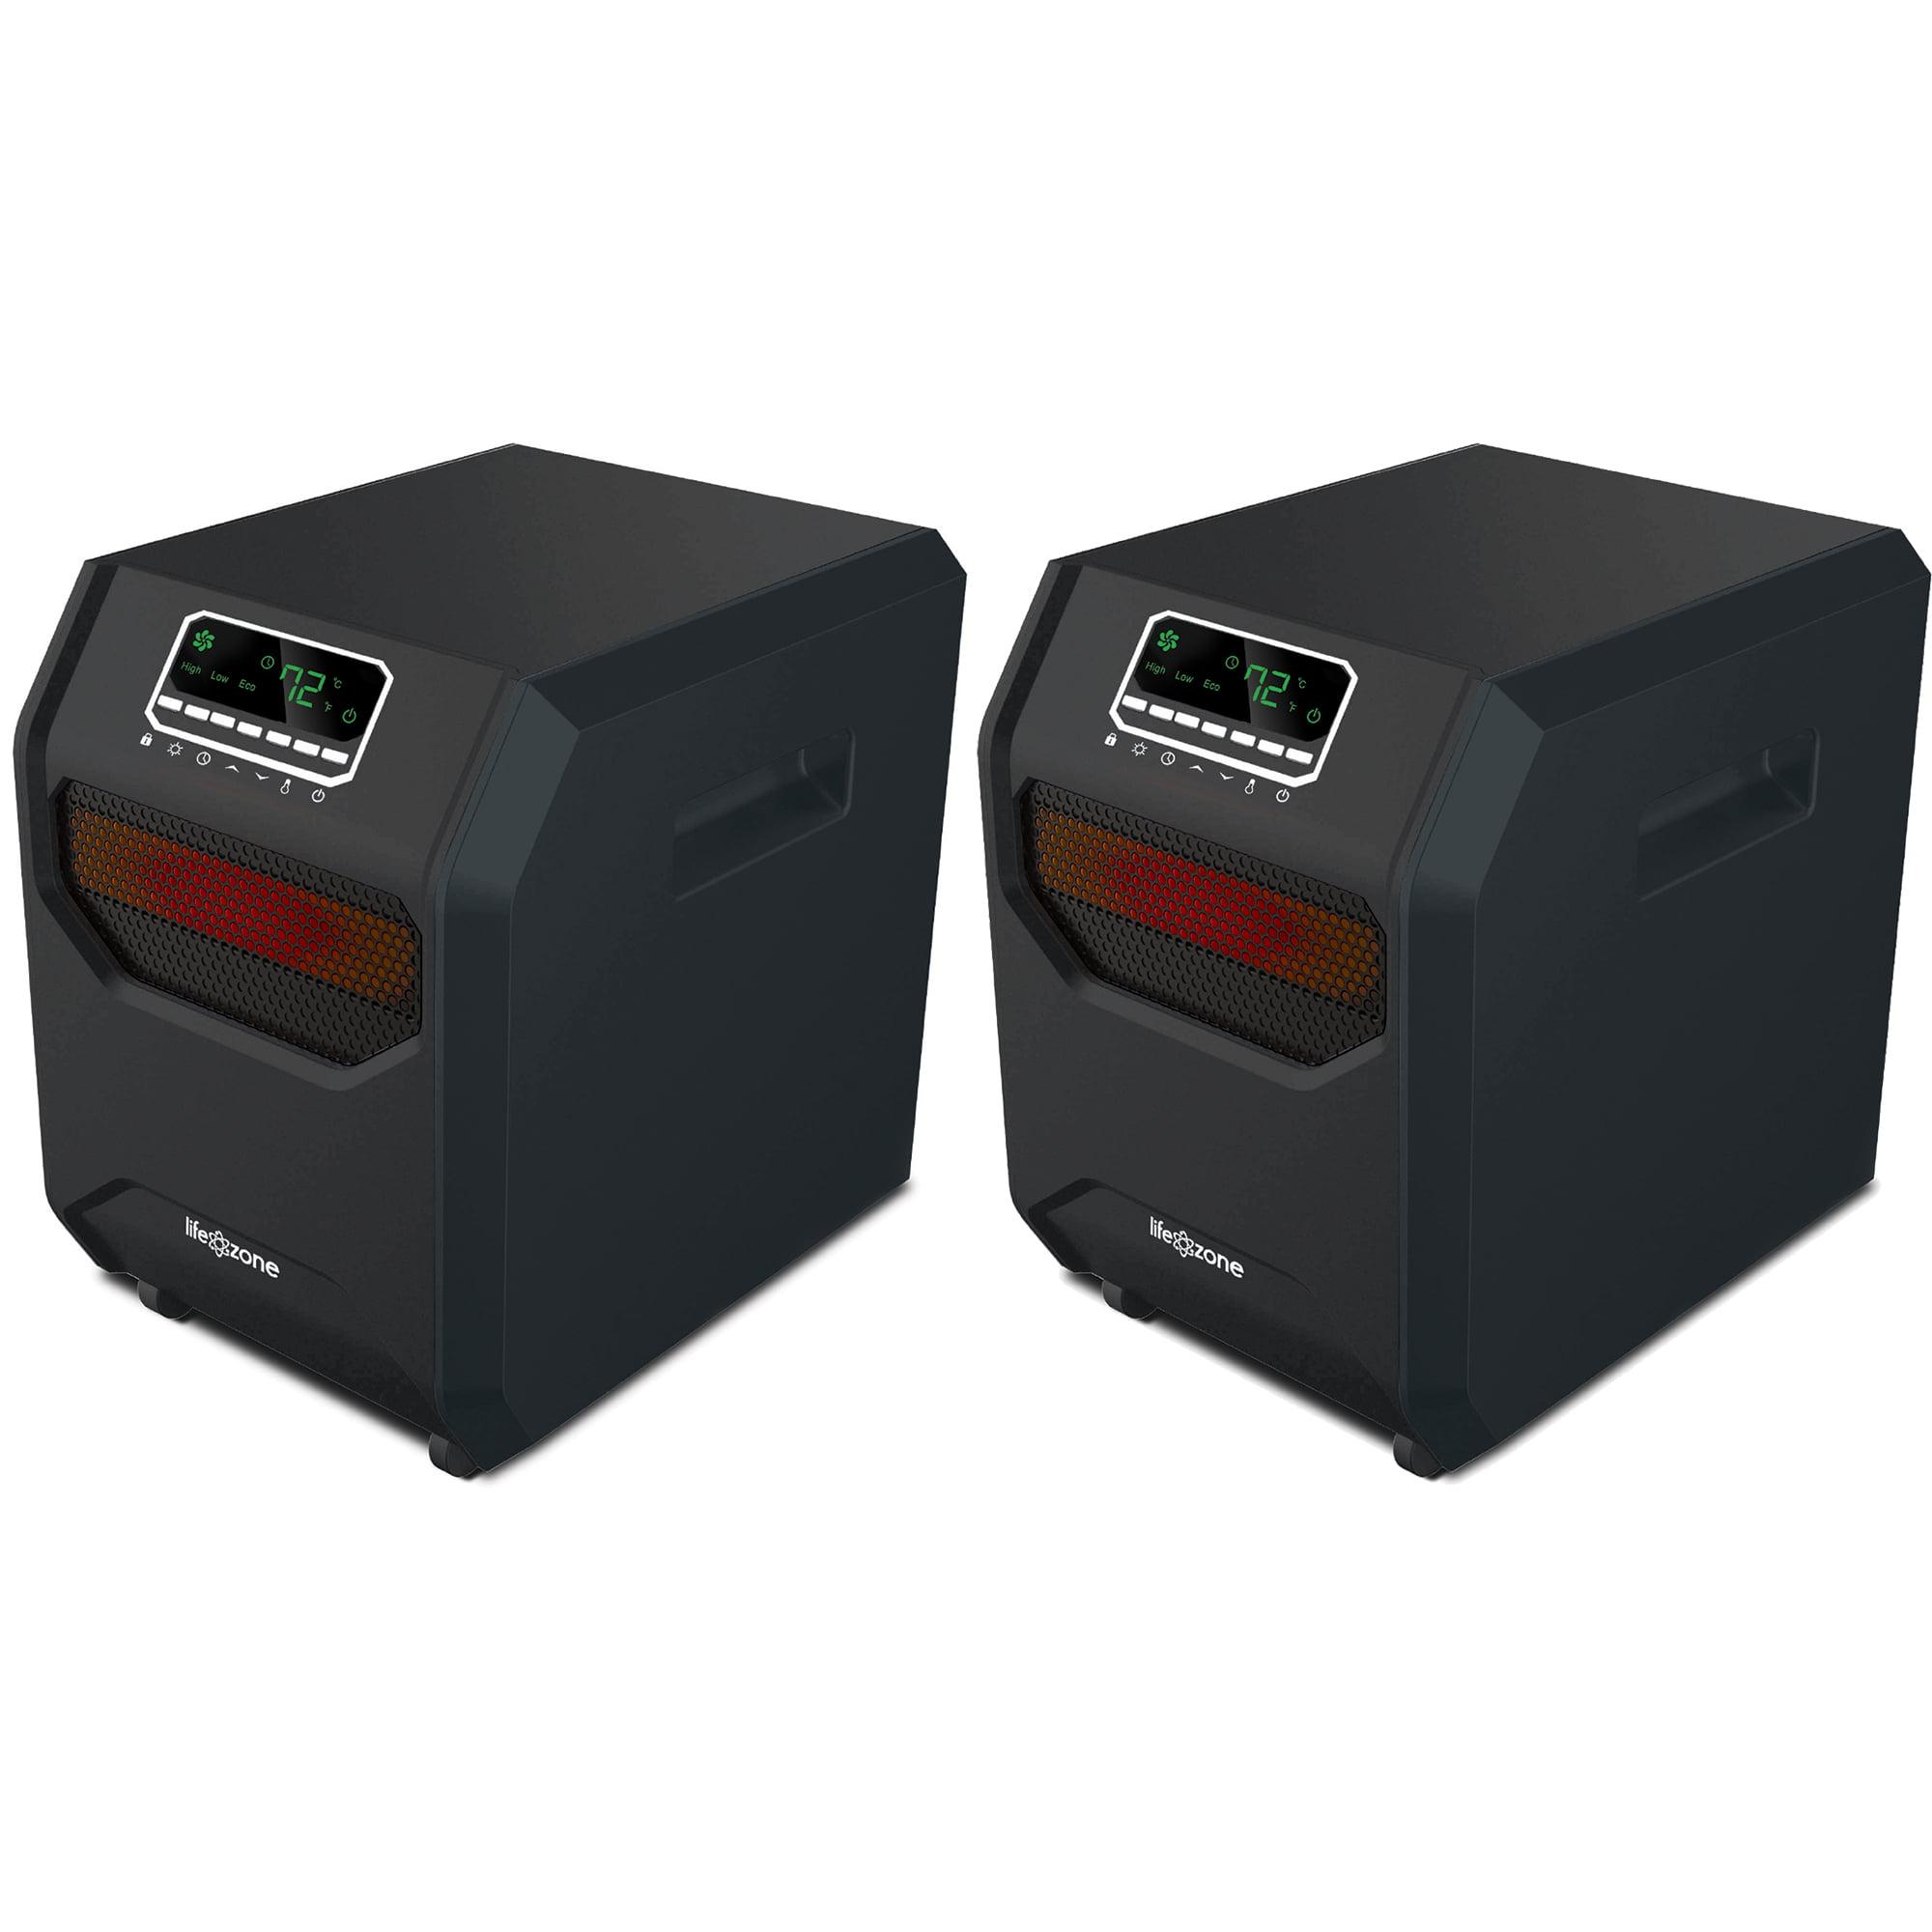 Lifesmart 4-Element Quartz Infrared Portable Electric Roo...